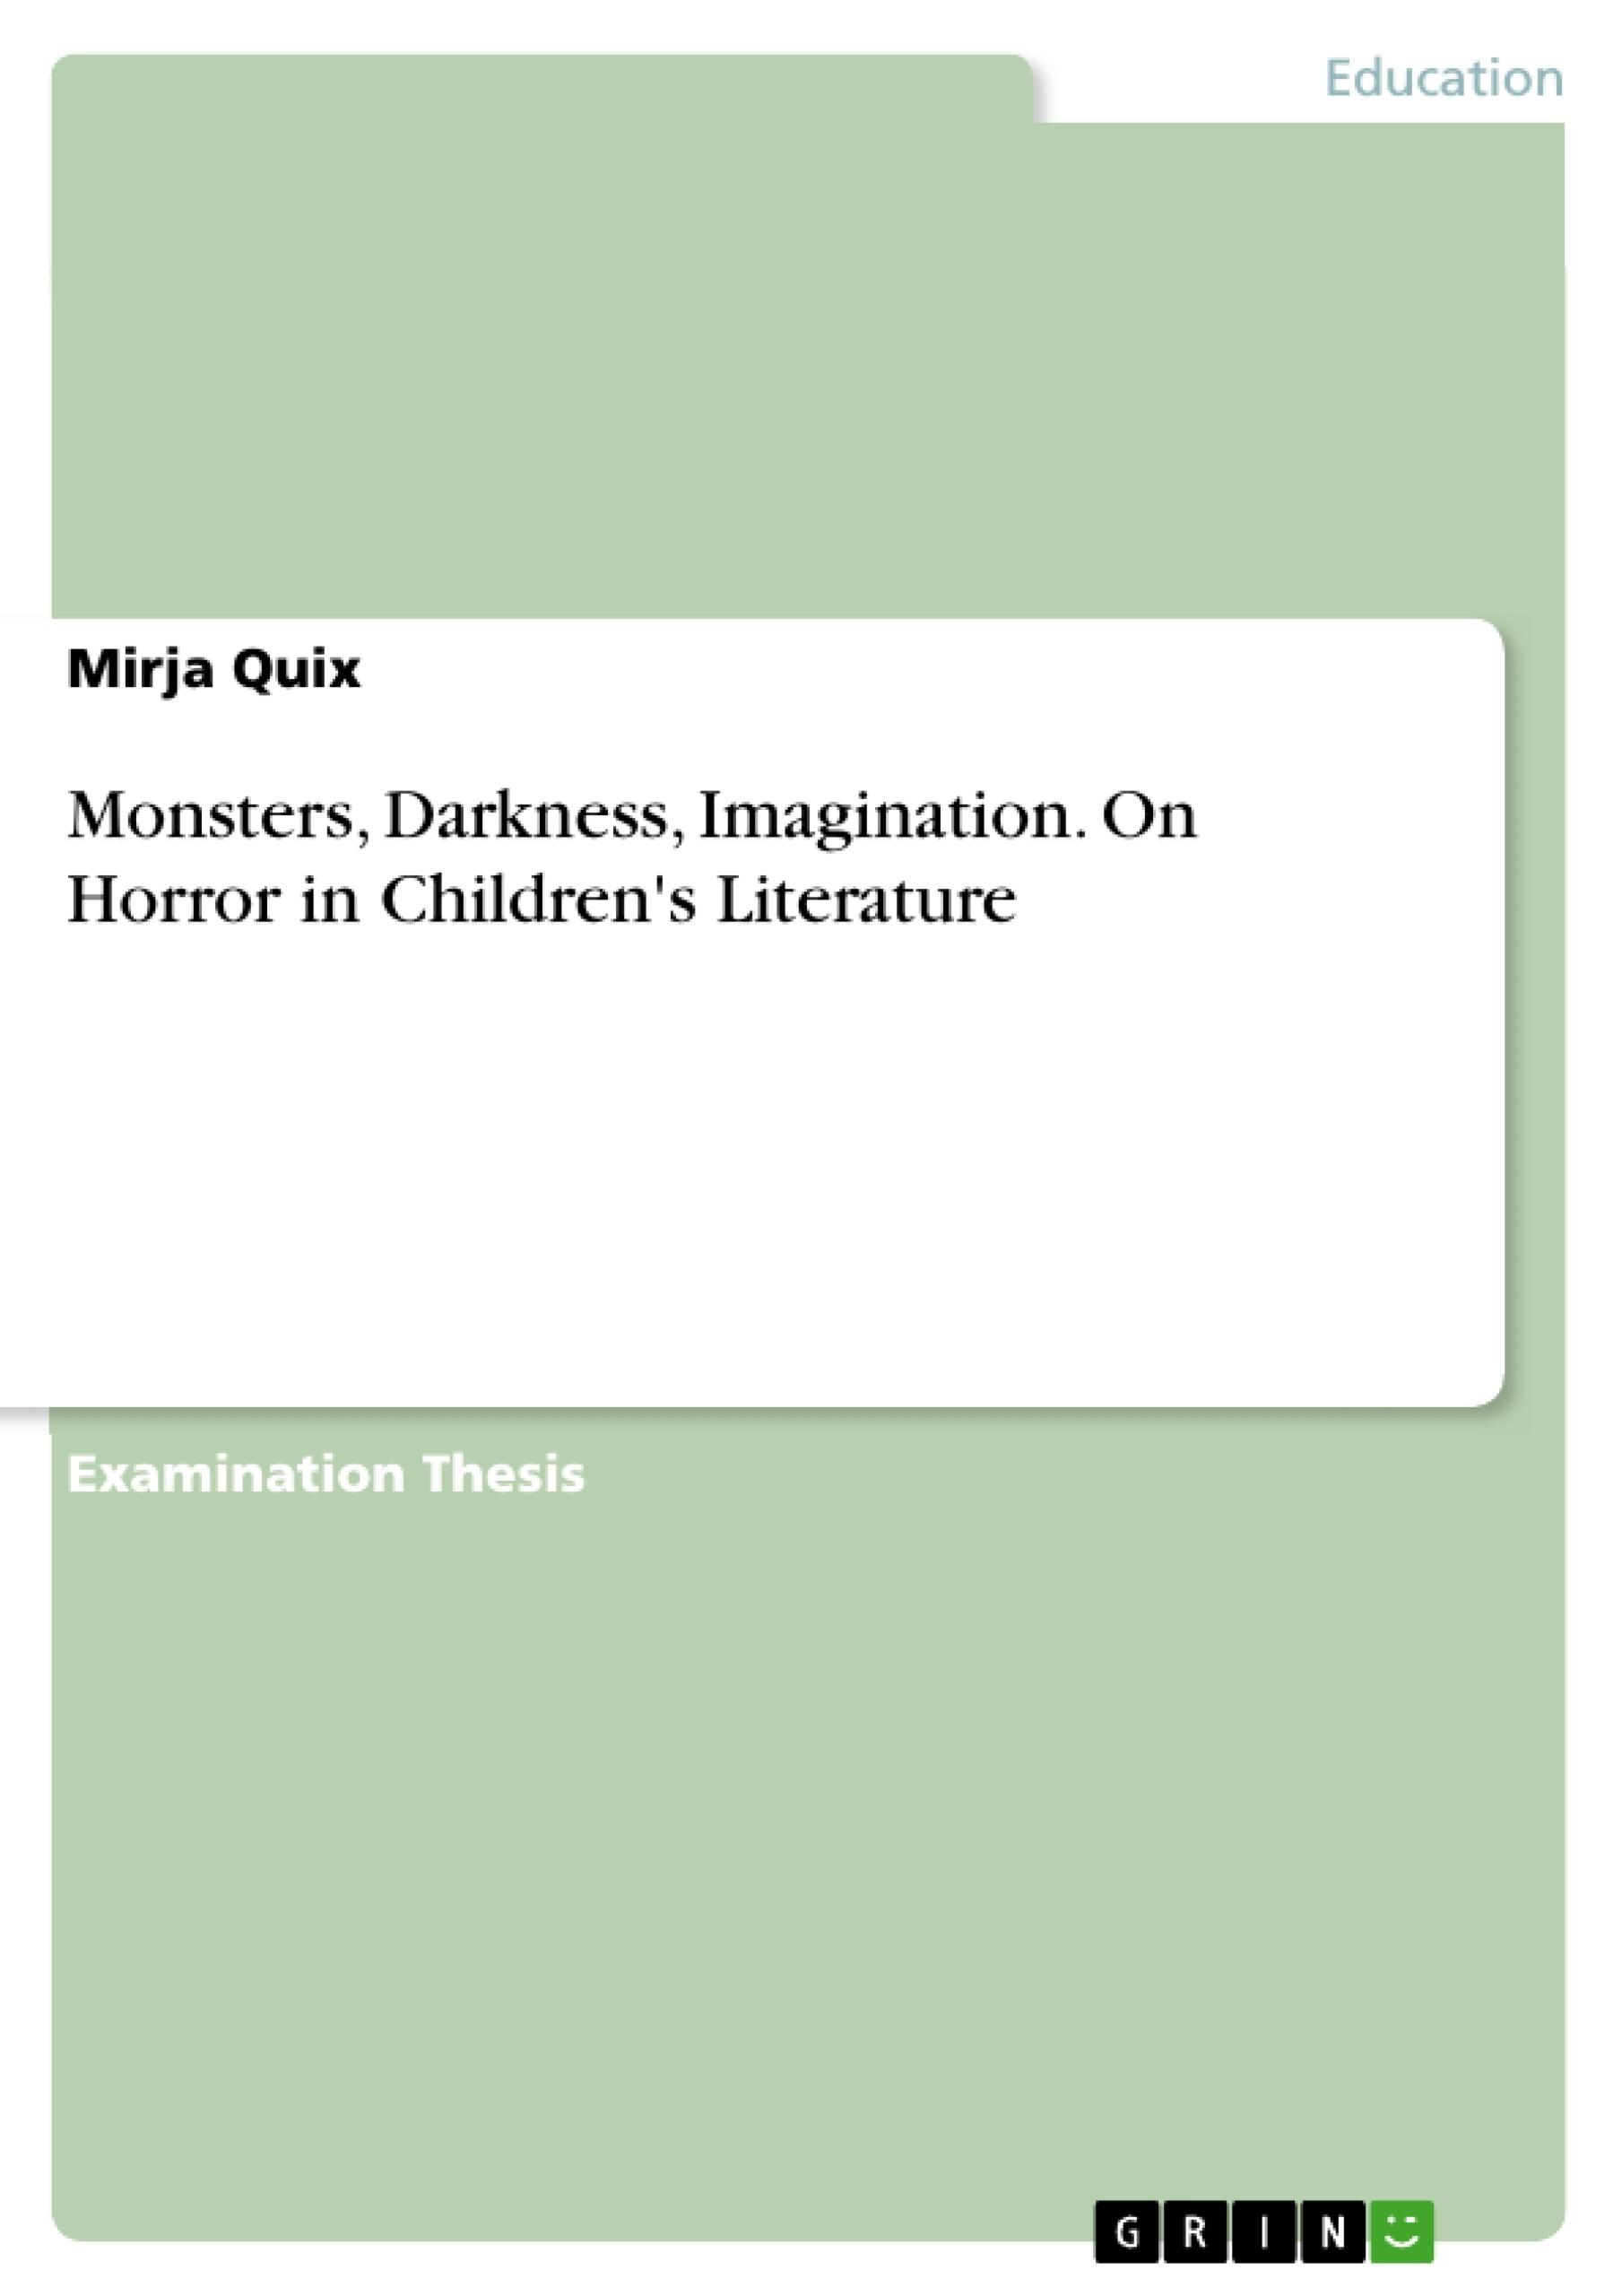 Title: Monsters, Darkness, Imagination. On Horror in Children's Literature